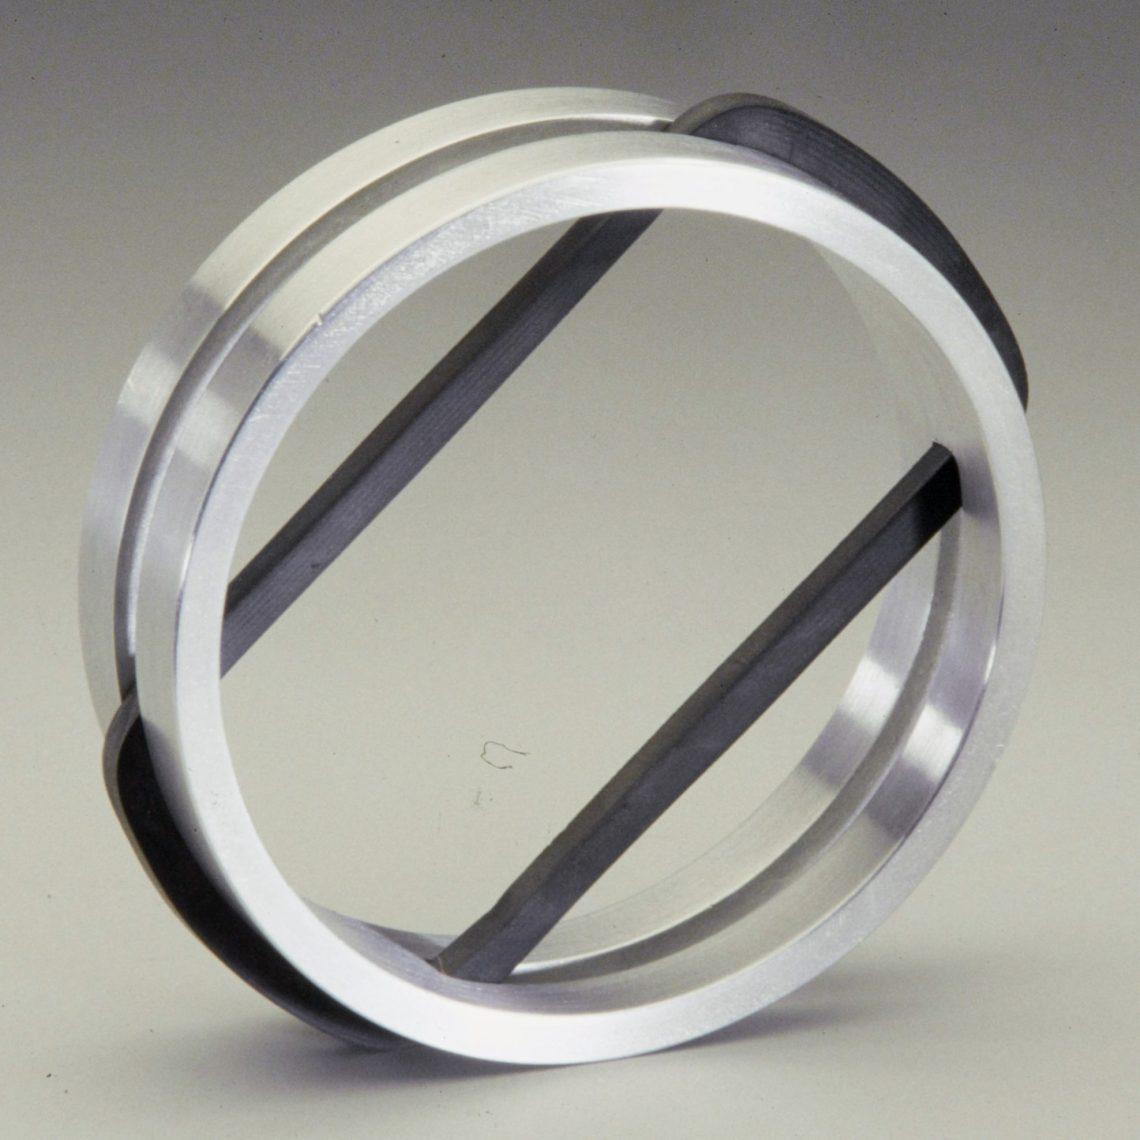 Hans Appenzeller, armband van aluminium en rubber, 1971